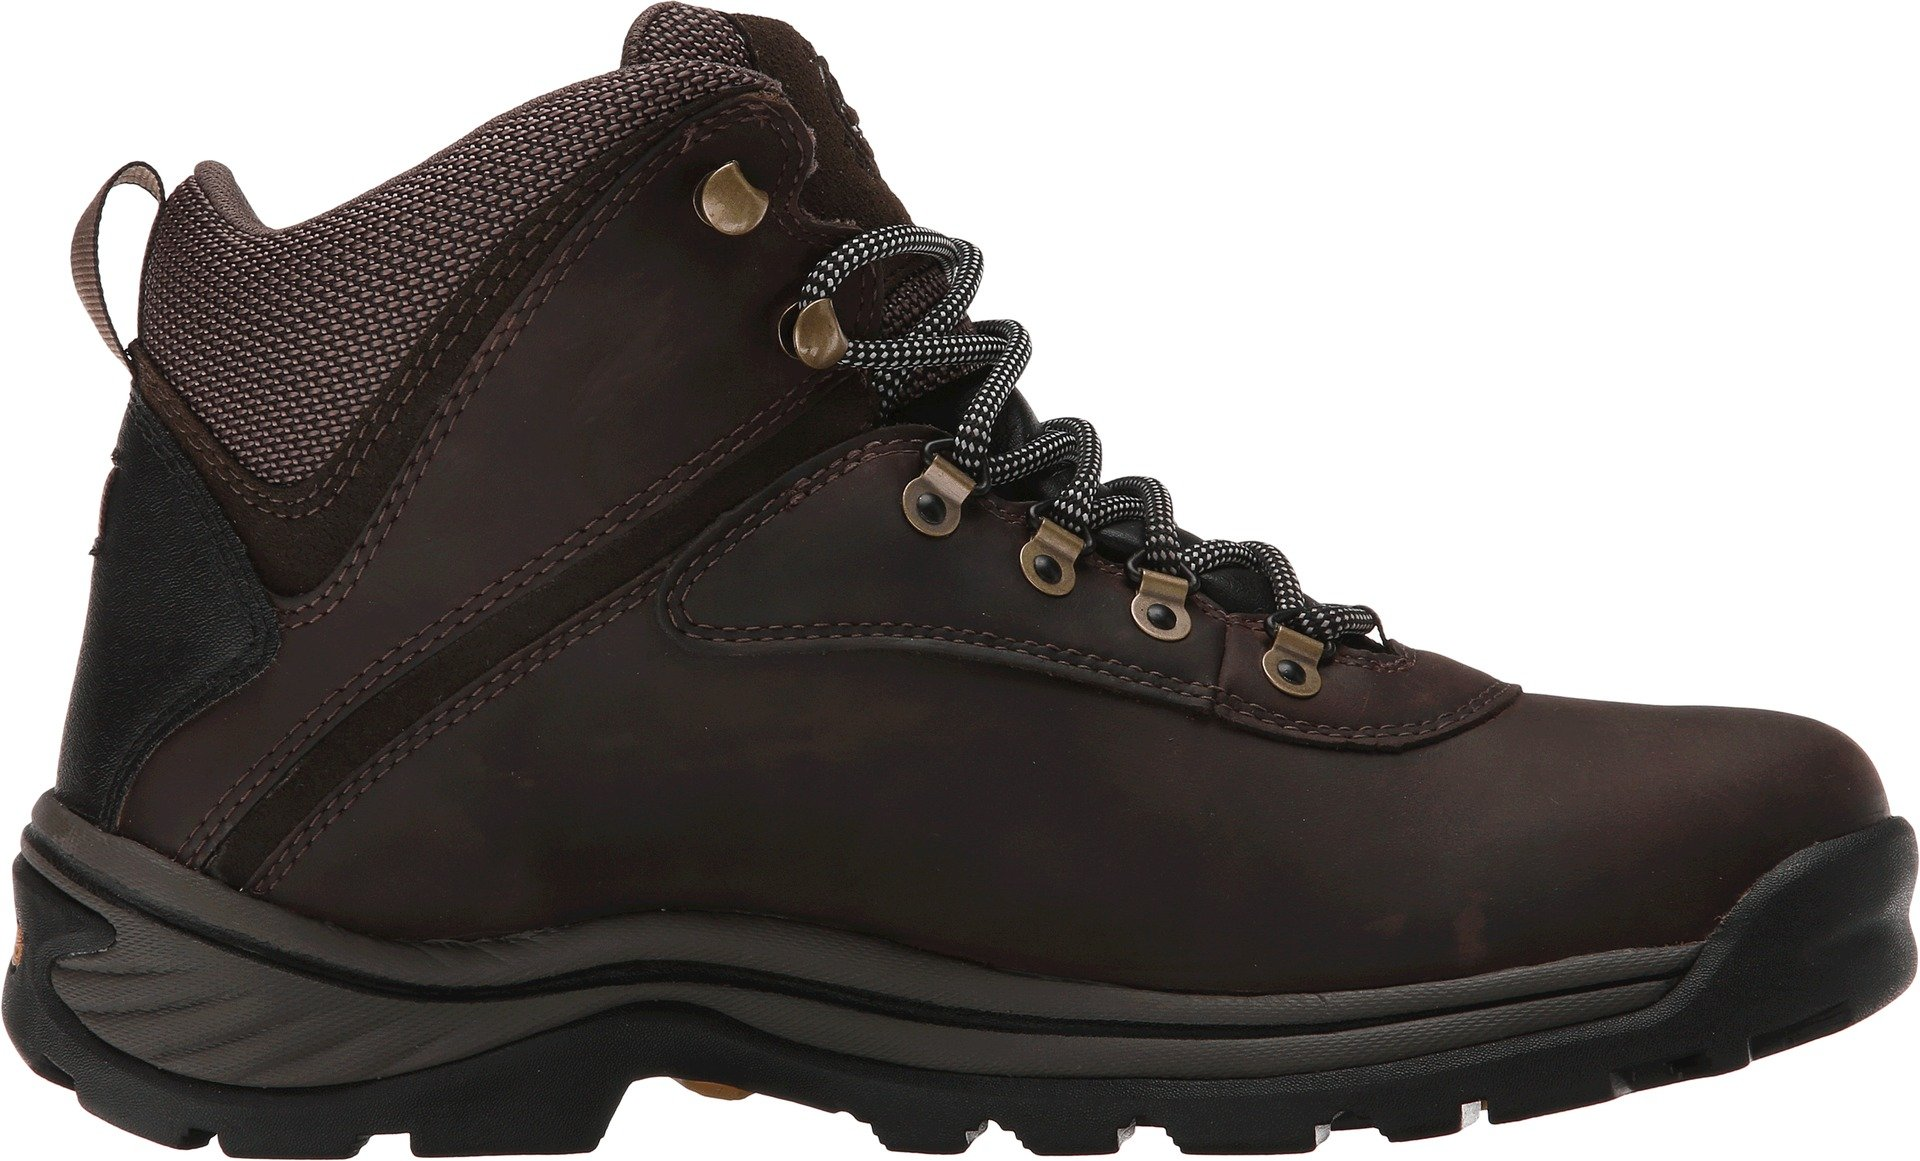 Timberland Men's White Ledge Mid Waterproof Boot,Dark Brown,9.5 W US by Timberland (Image #2)